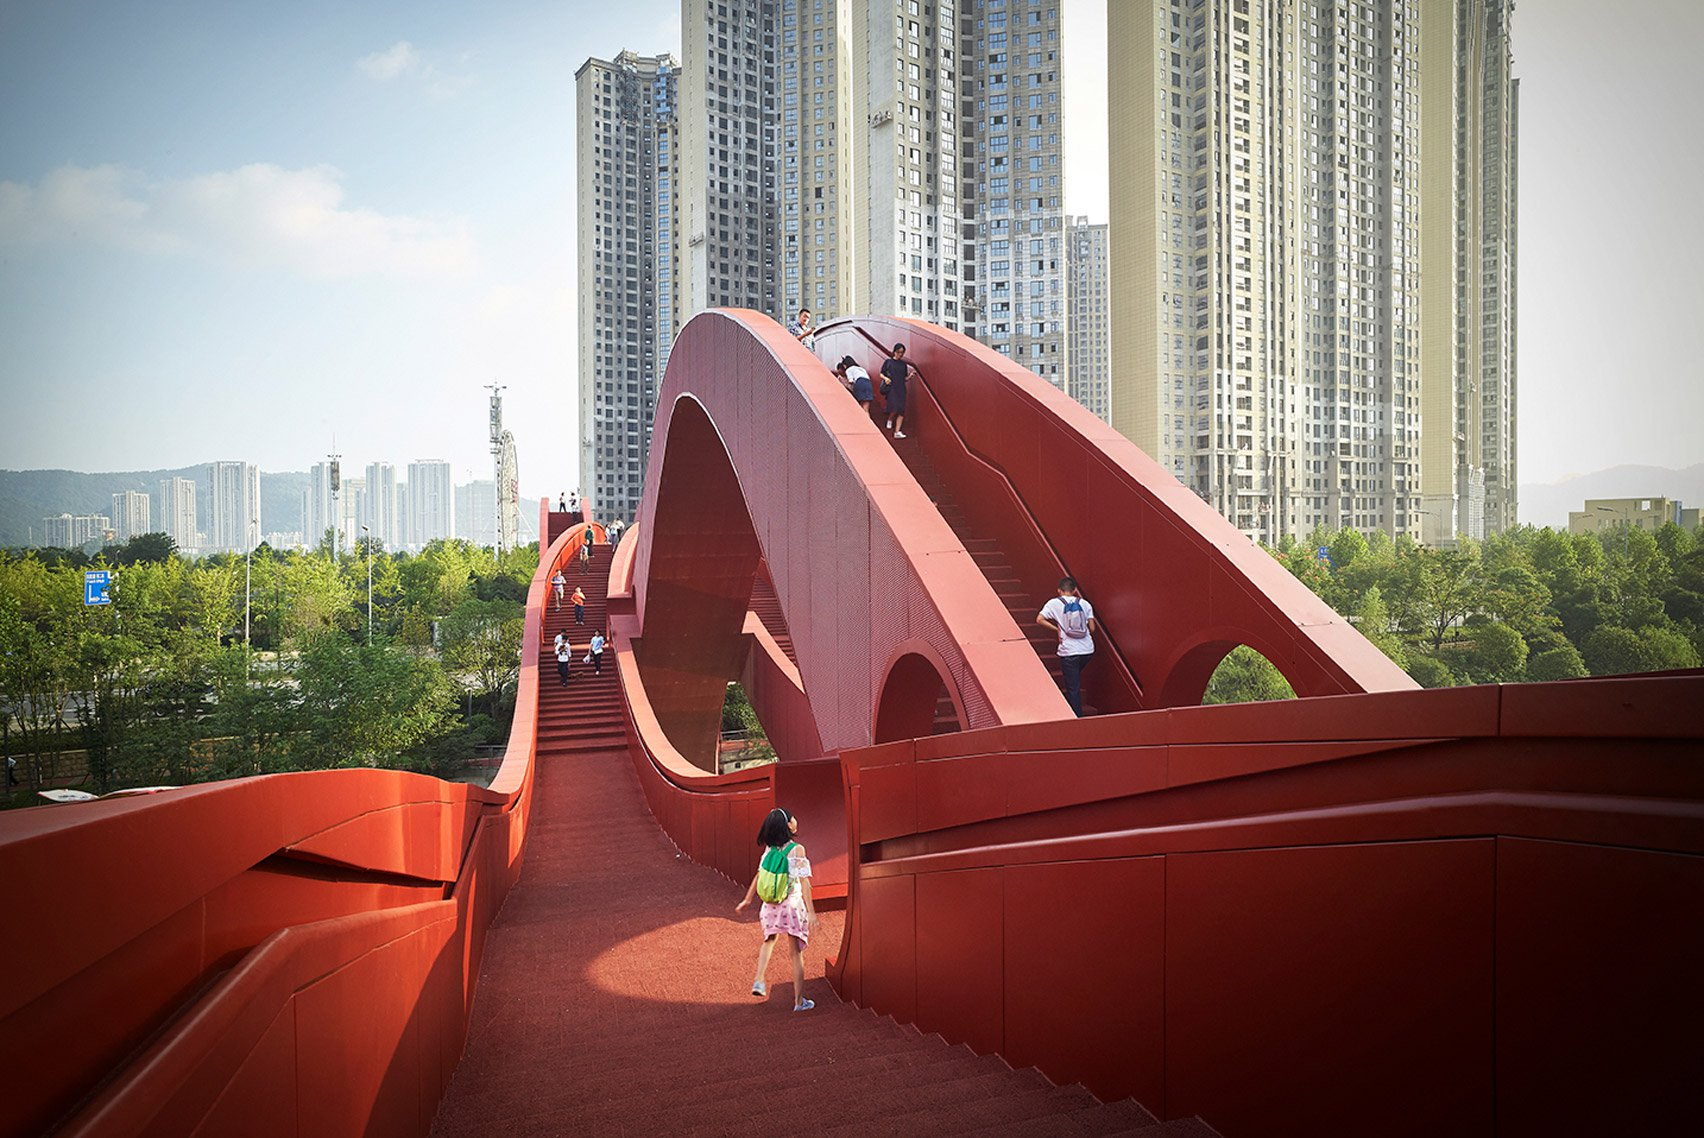 lucky-knot-pedestrian-bridge-infrastructure-design-architecture-next-architects-meixi-lake-china_dezeen_1704_col_0-1